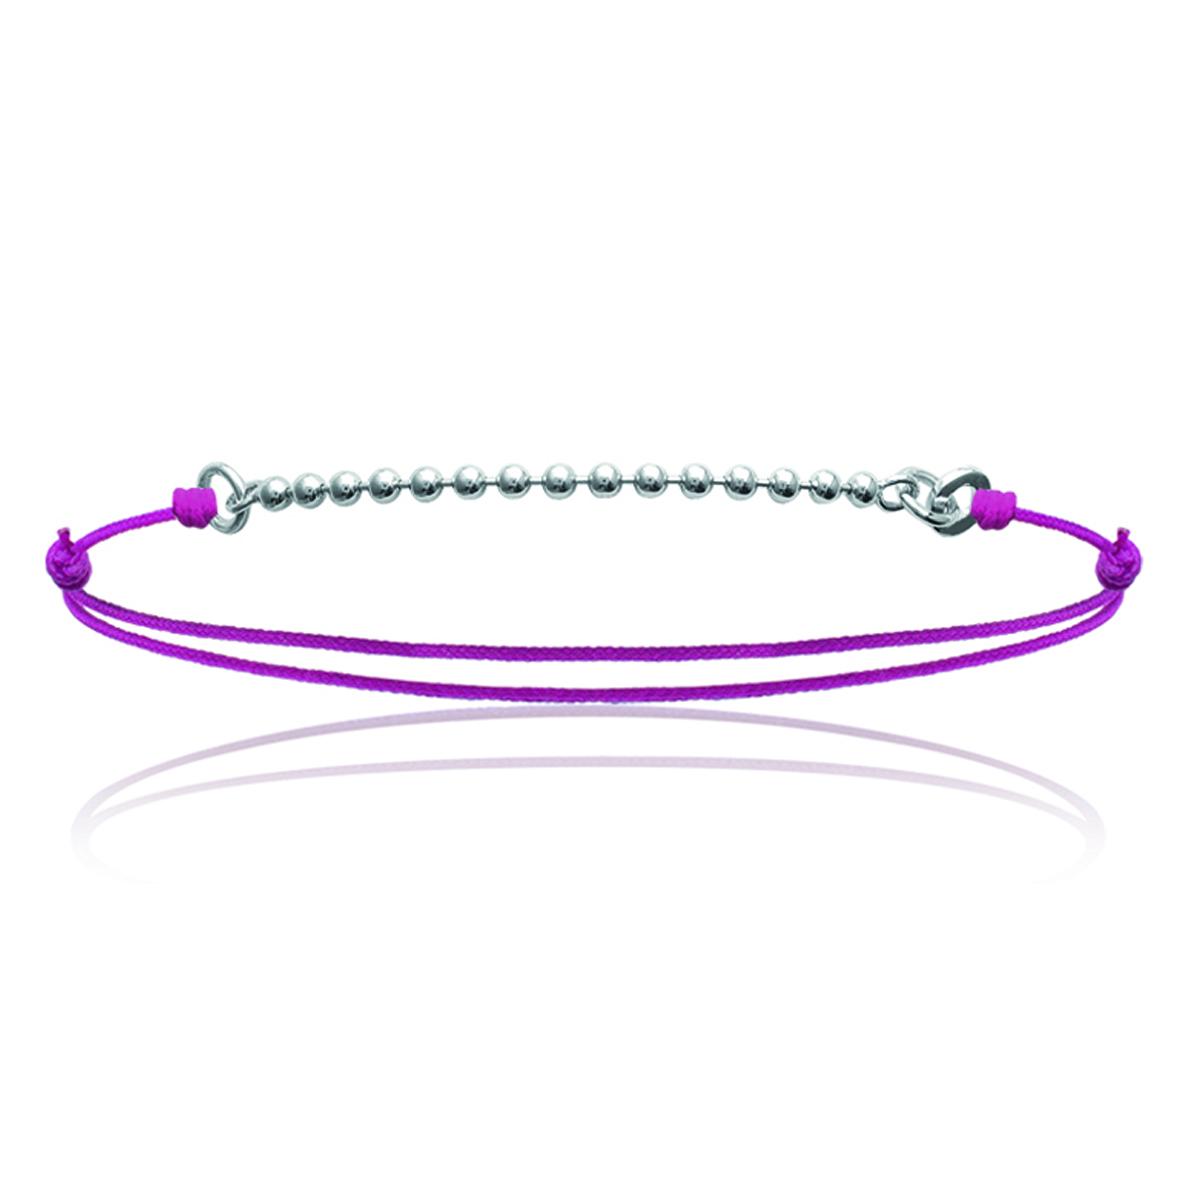 Bracelet Argent \'Billes\' rose argenté - 15 mm - [J0822]